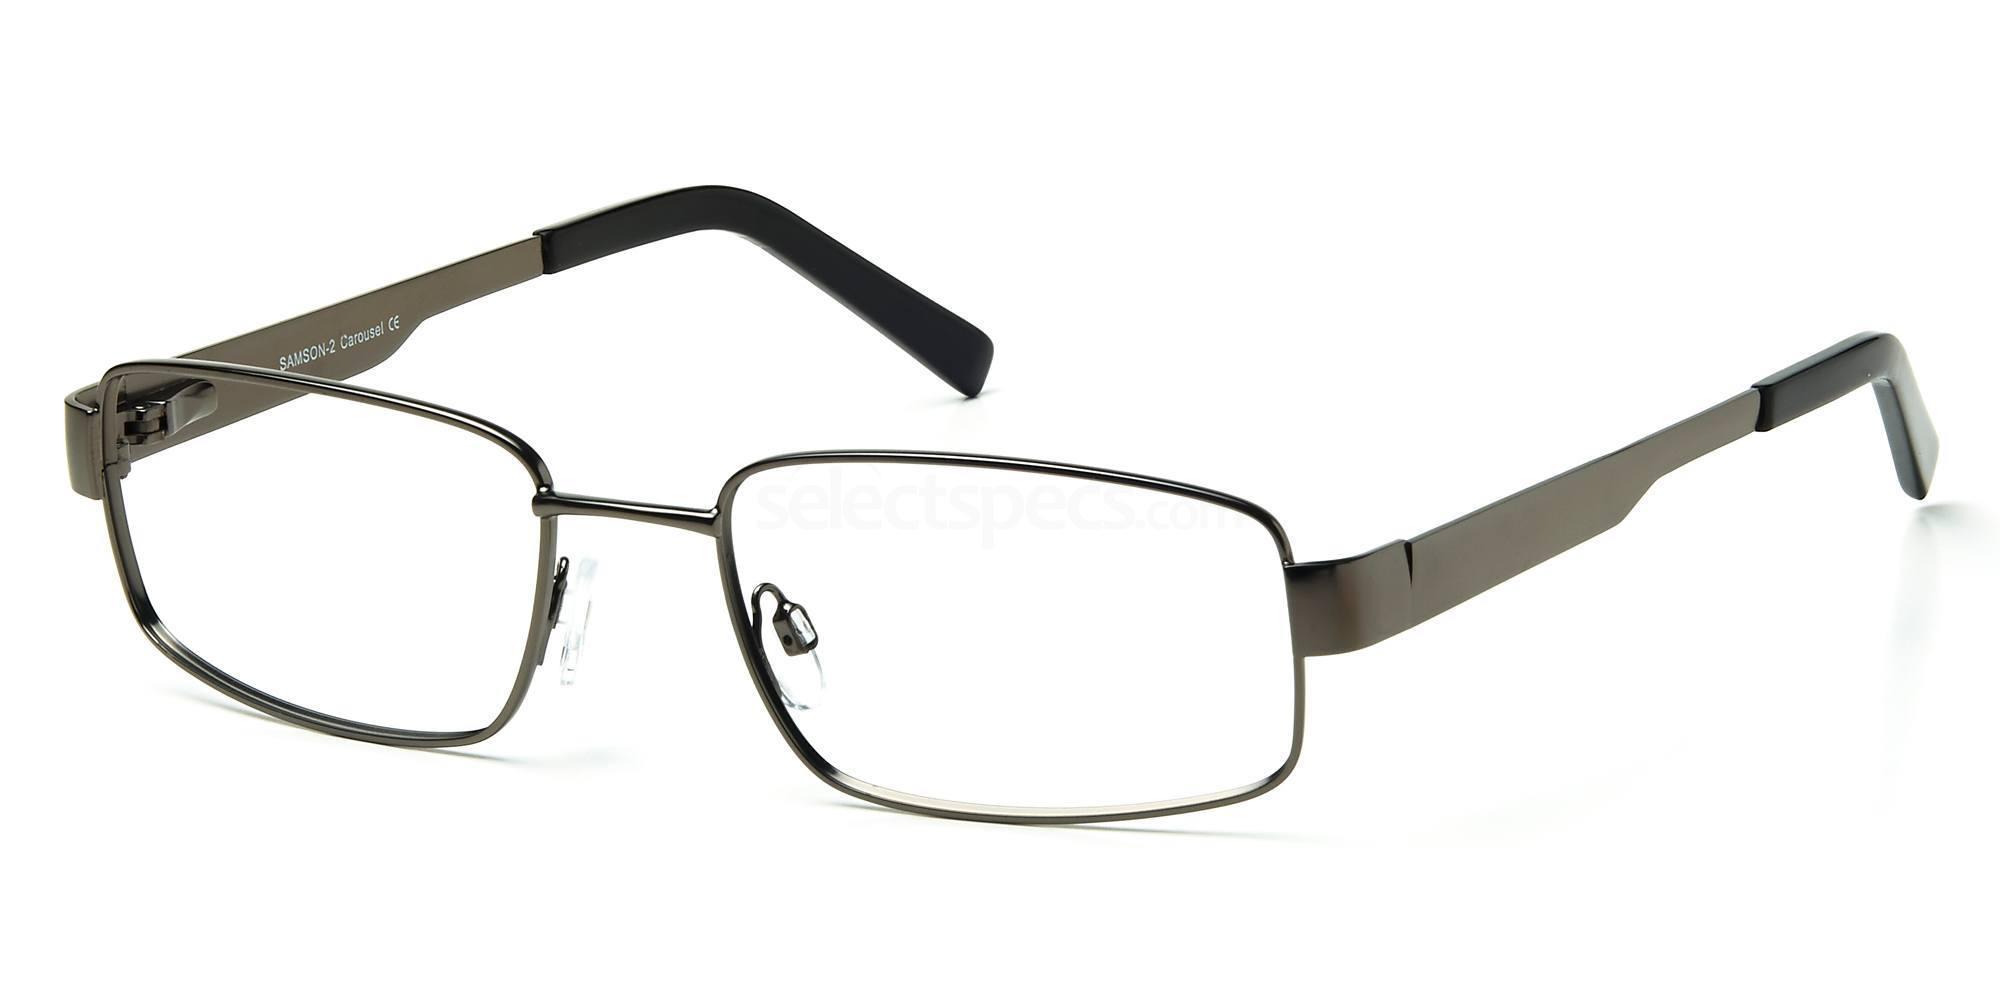 C1 SAMSON02 Glasses, Samson